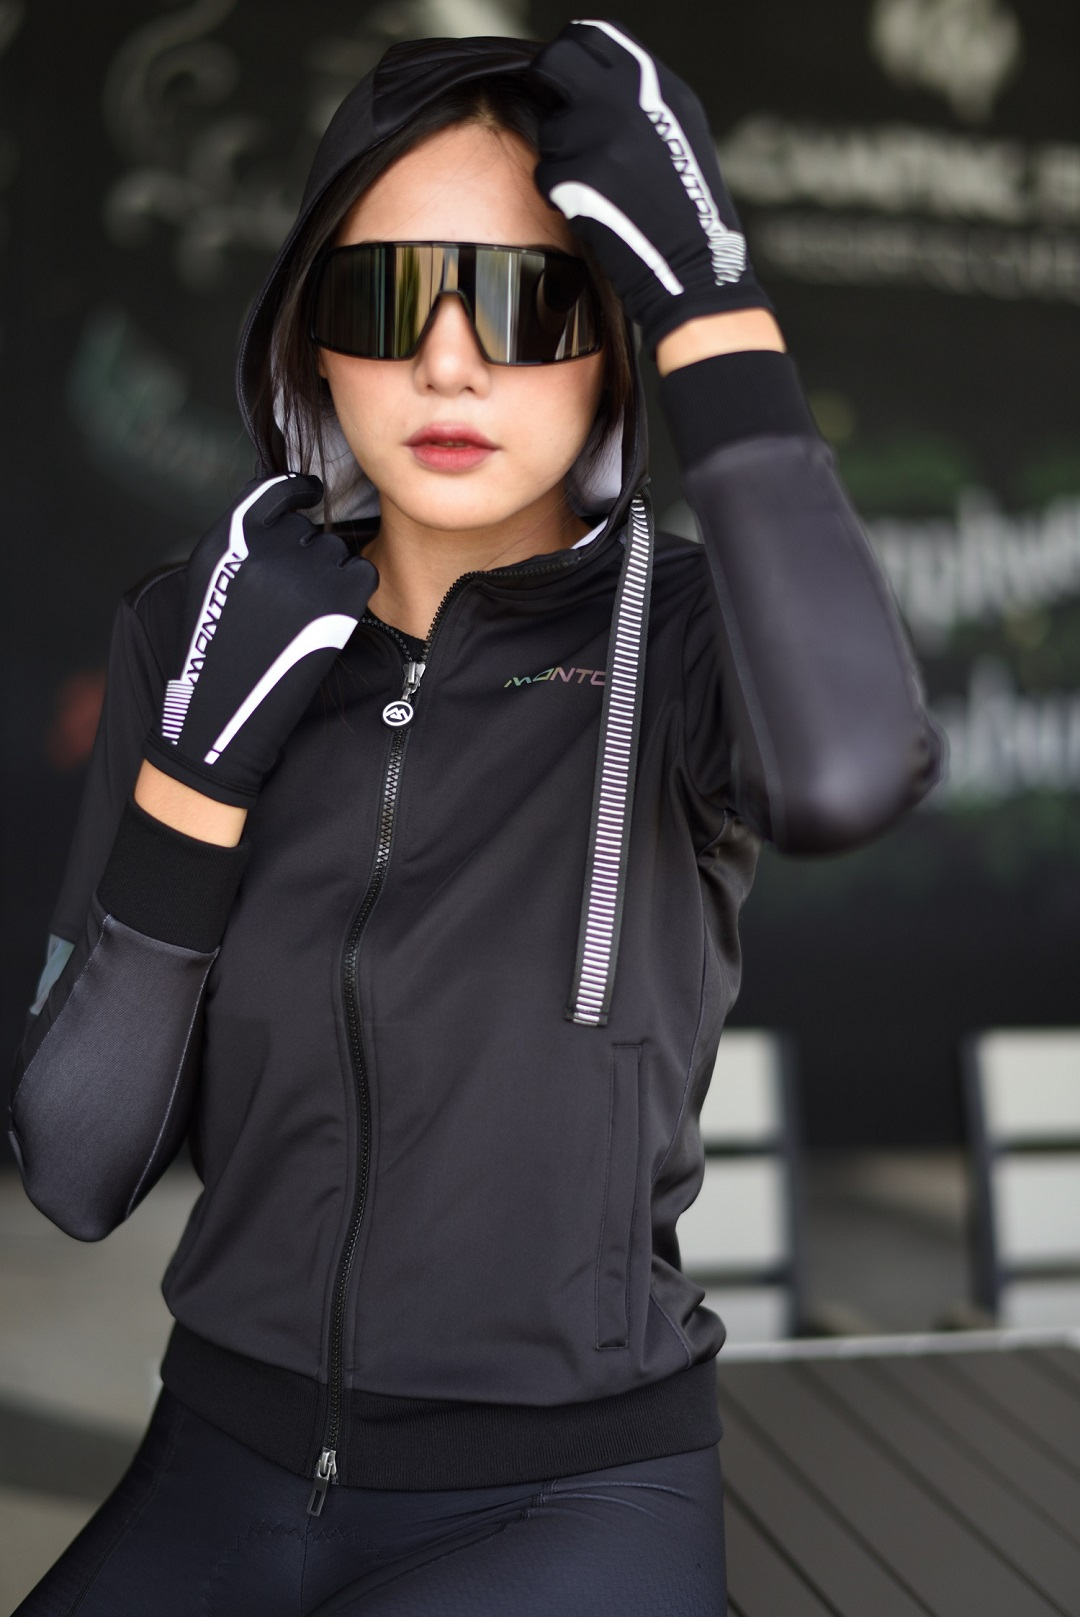 women's commuter cycling clothing